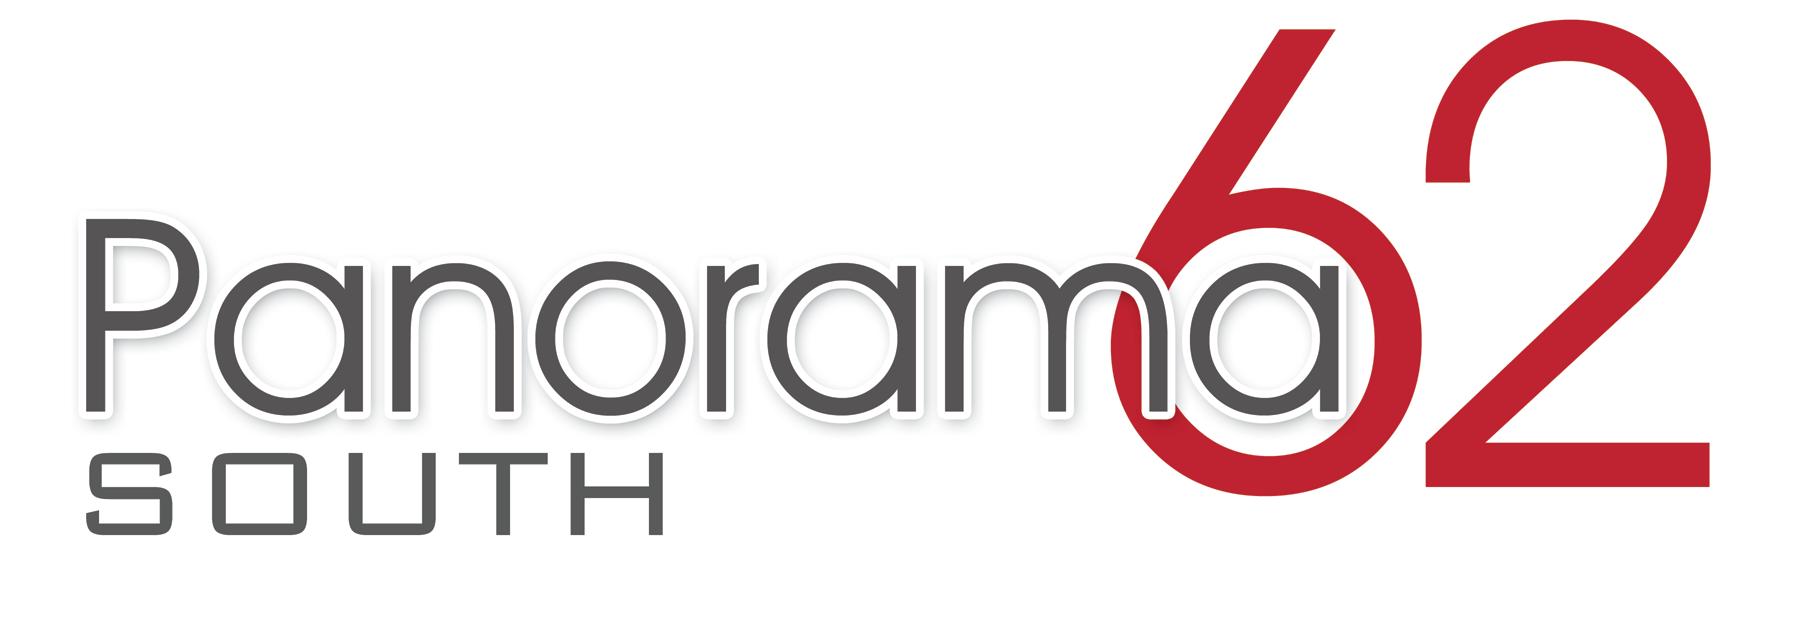 ps62_logo